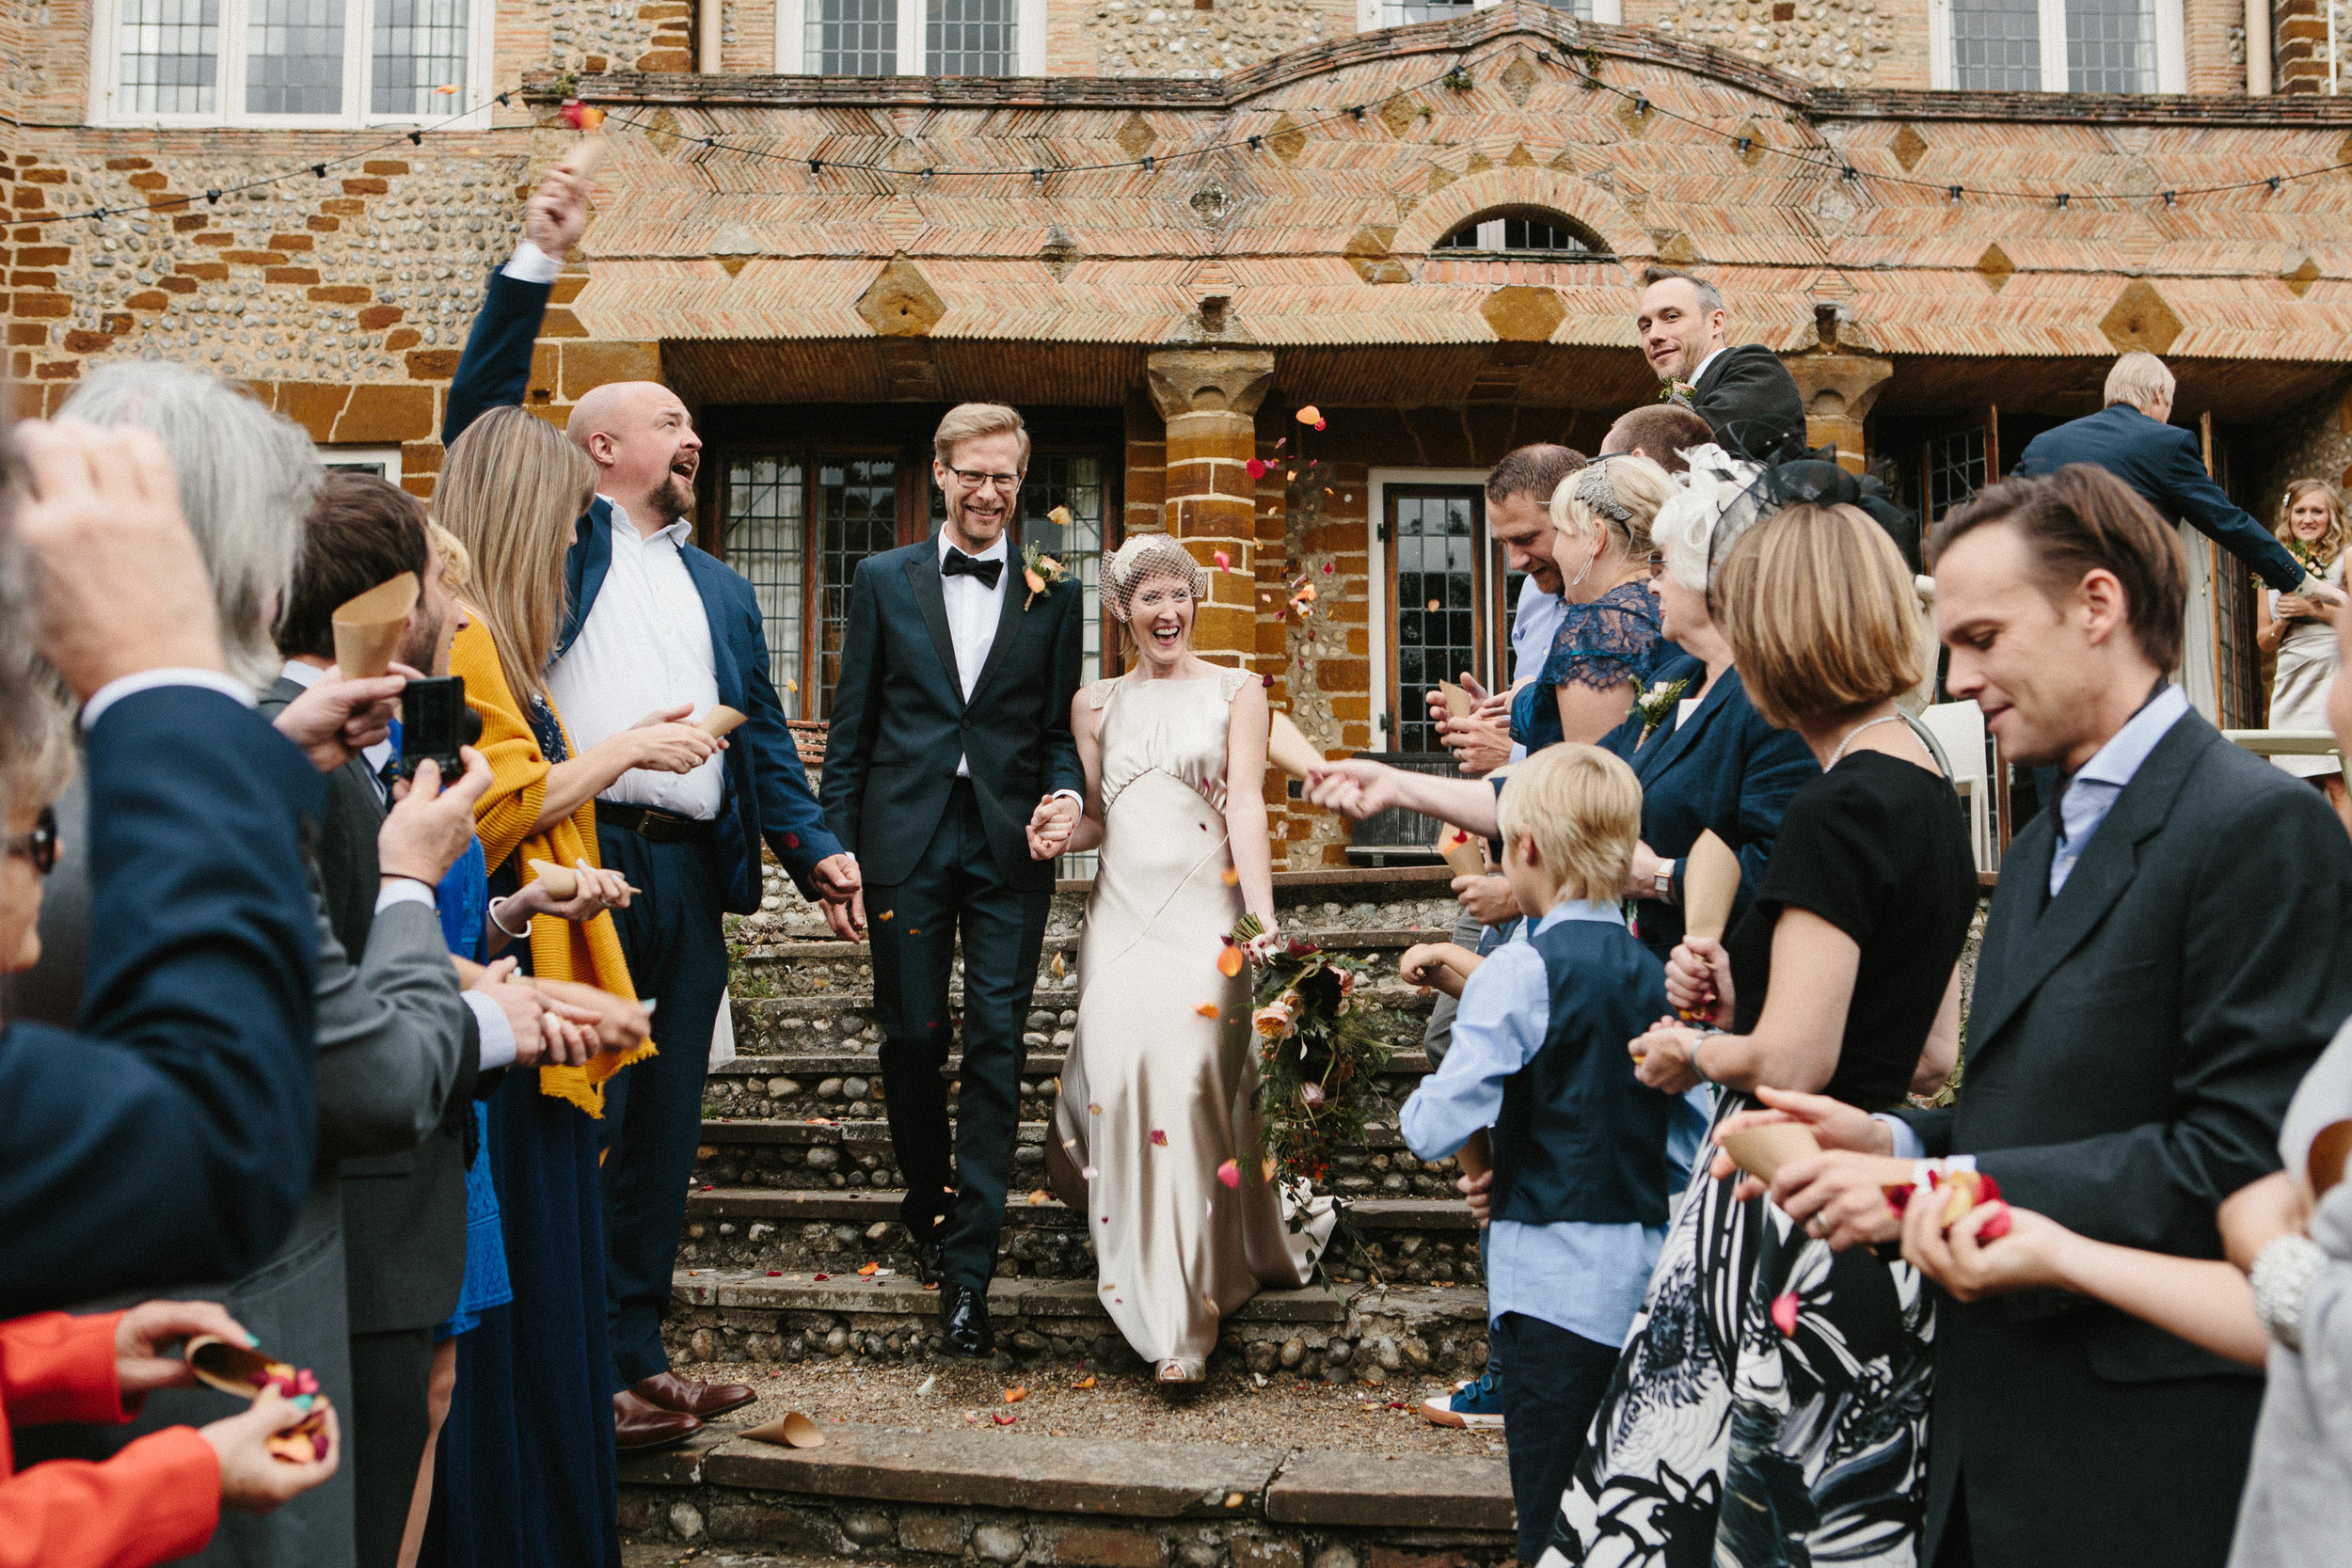 Kate-Beaumont-Sheffield-Honeysuckle-bias-cut-wedding-dress-oyster-Rosie16.jpg